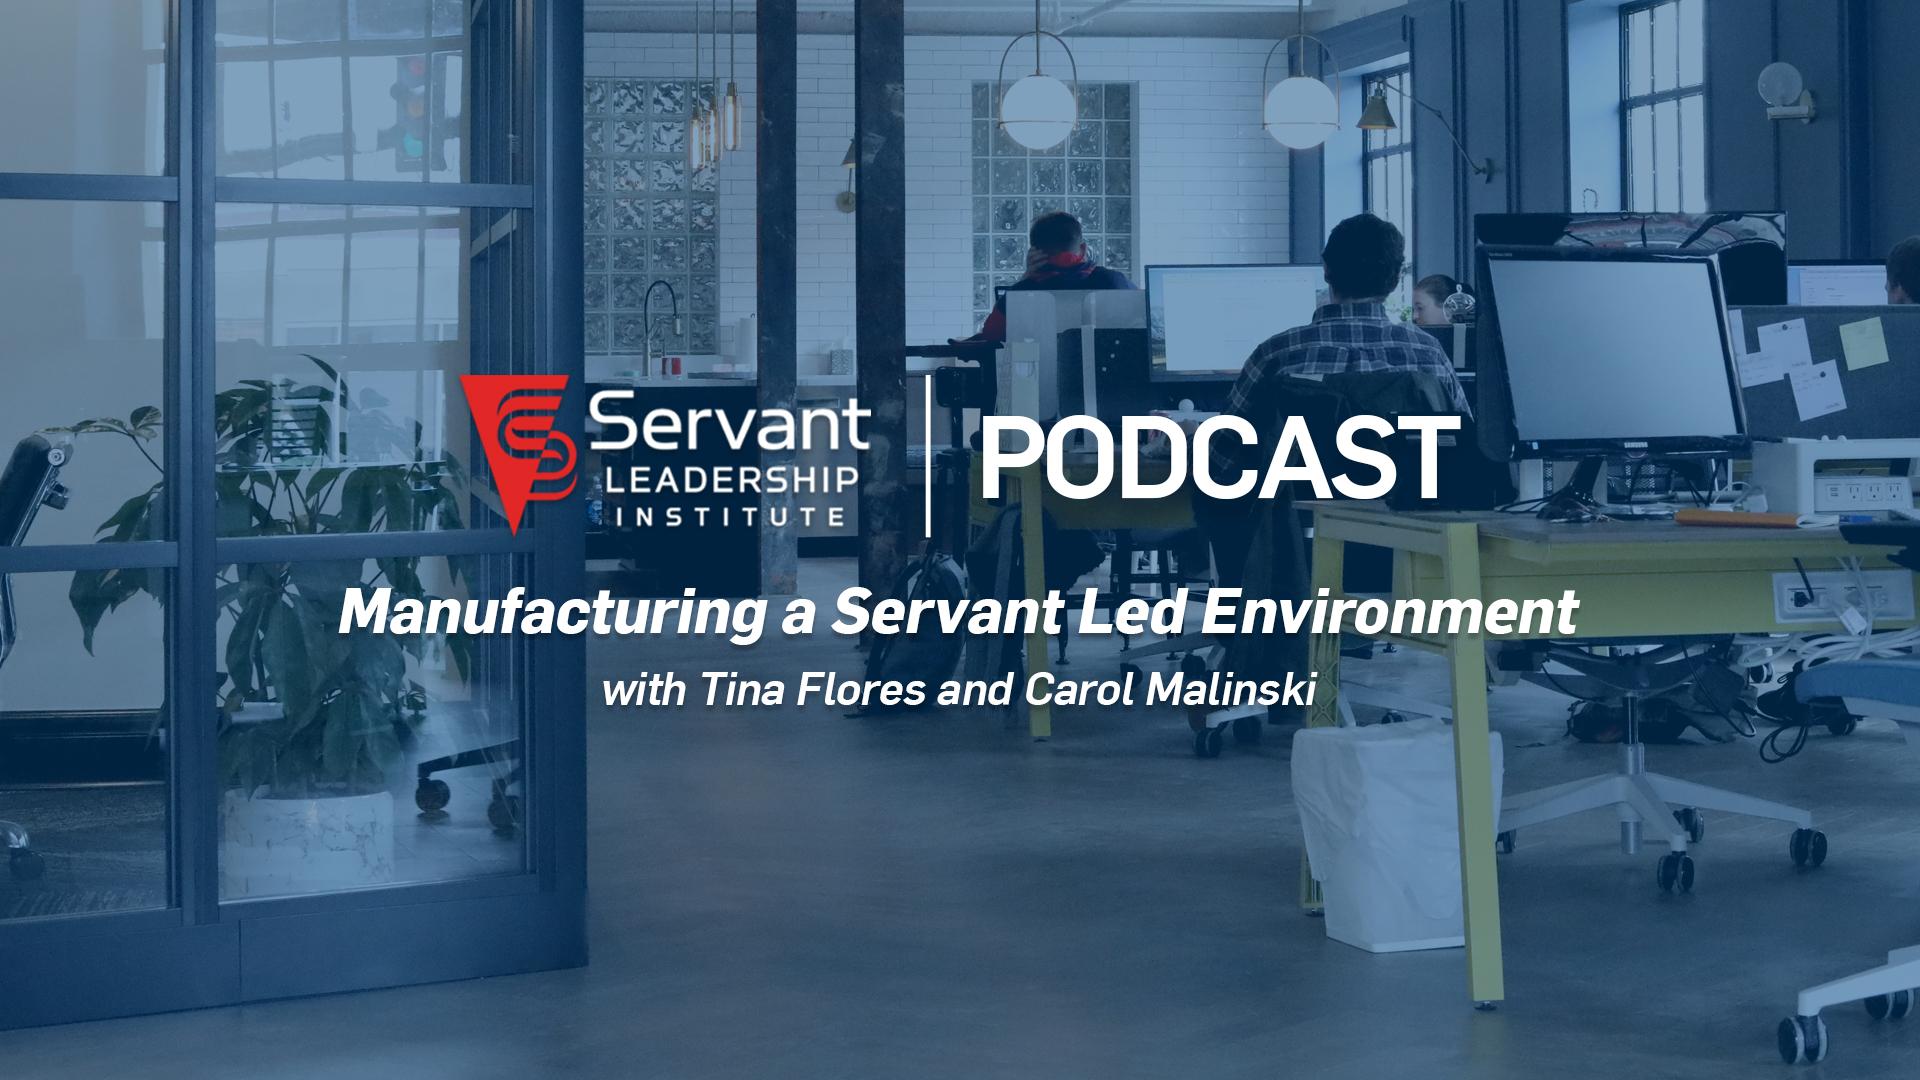 Manufacturing Servant Leadership 1920x1080.jpg